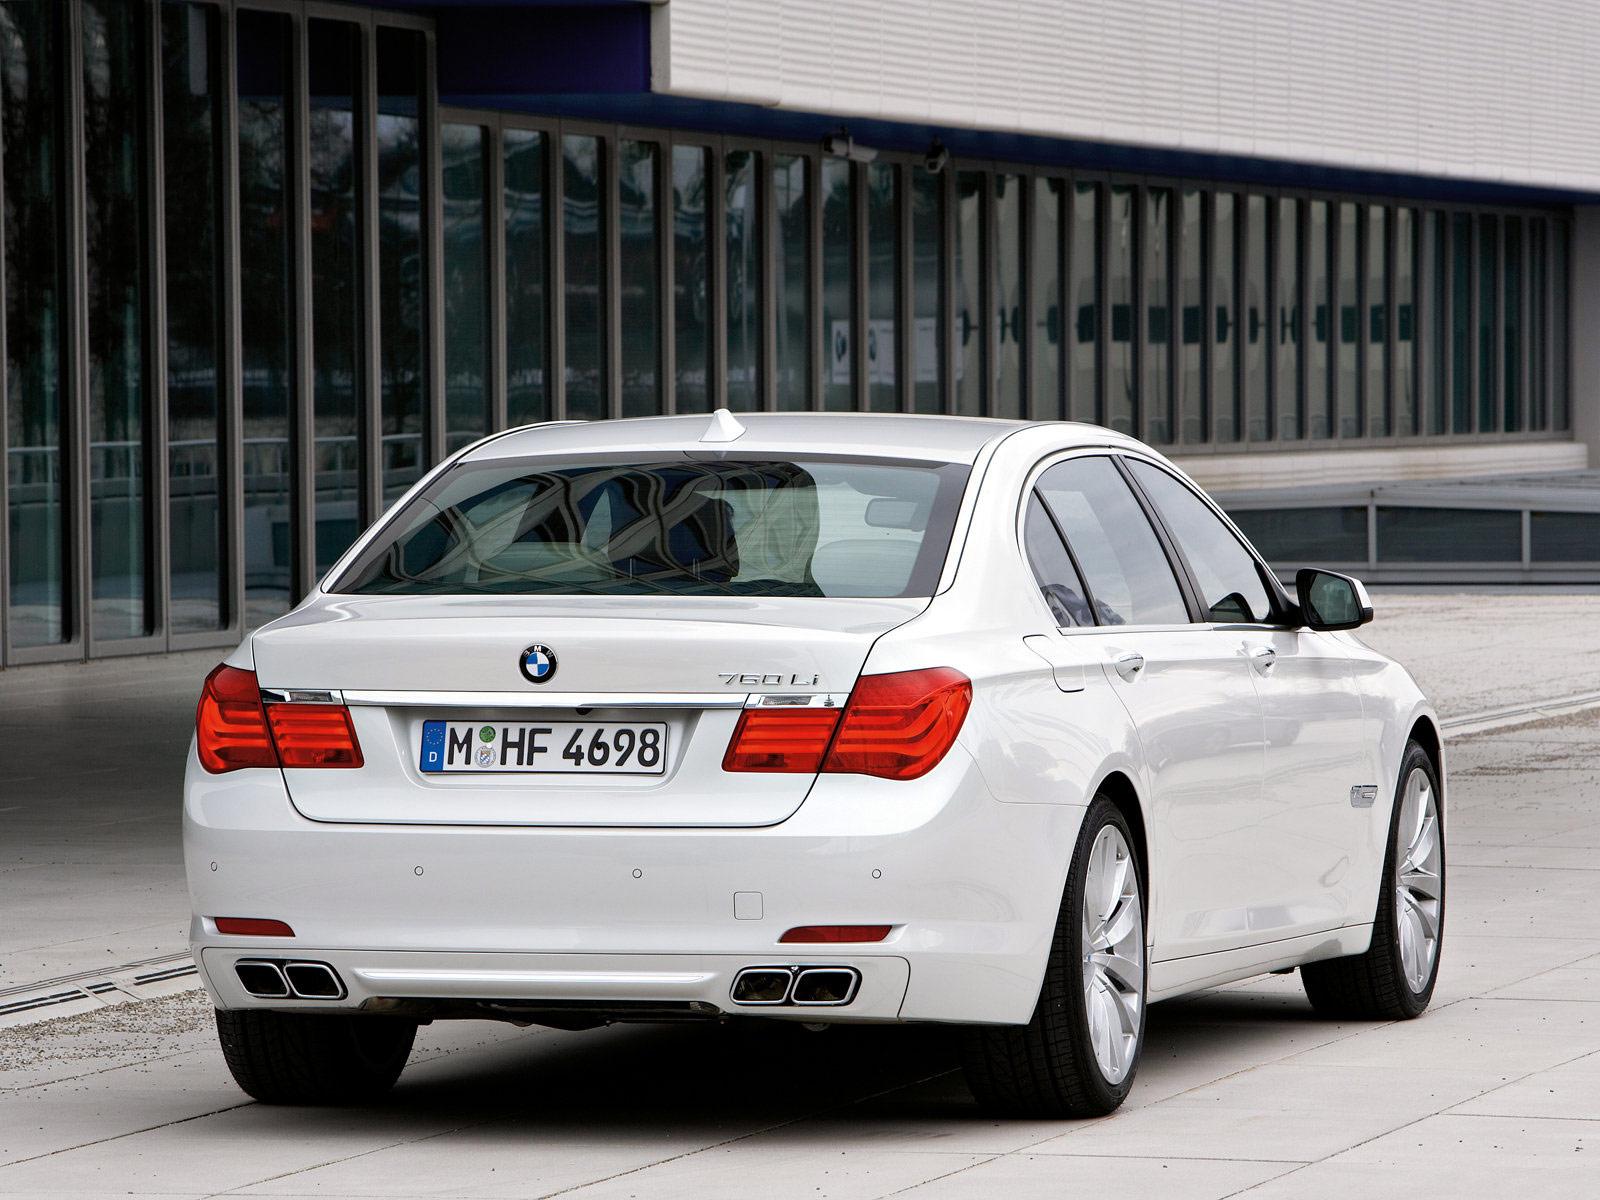 2010 BMW 760Li car accident lawyers info, wallpapers